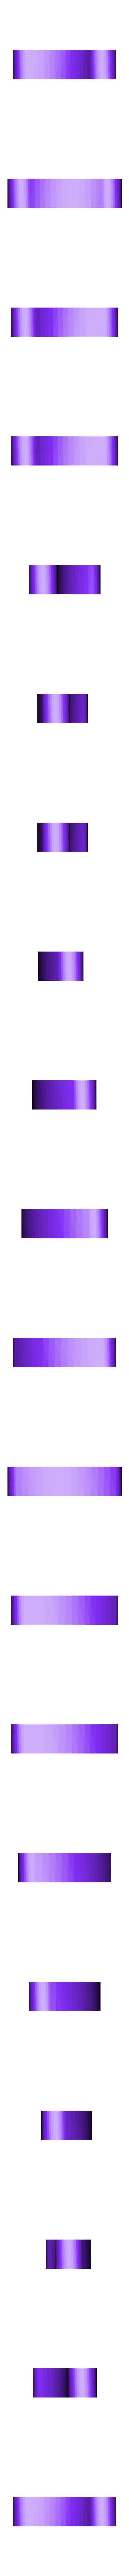 4holesMedium.STL Download free STL file CurvedLinks: Medium size circular links (LEGO Compatible) • 3D print template, byucmr